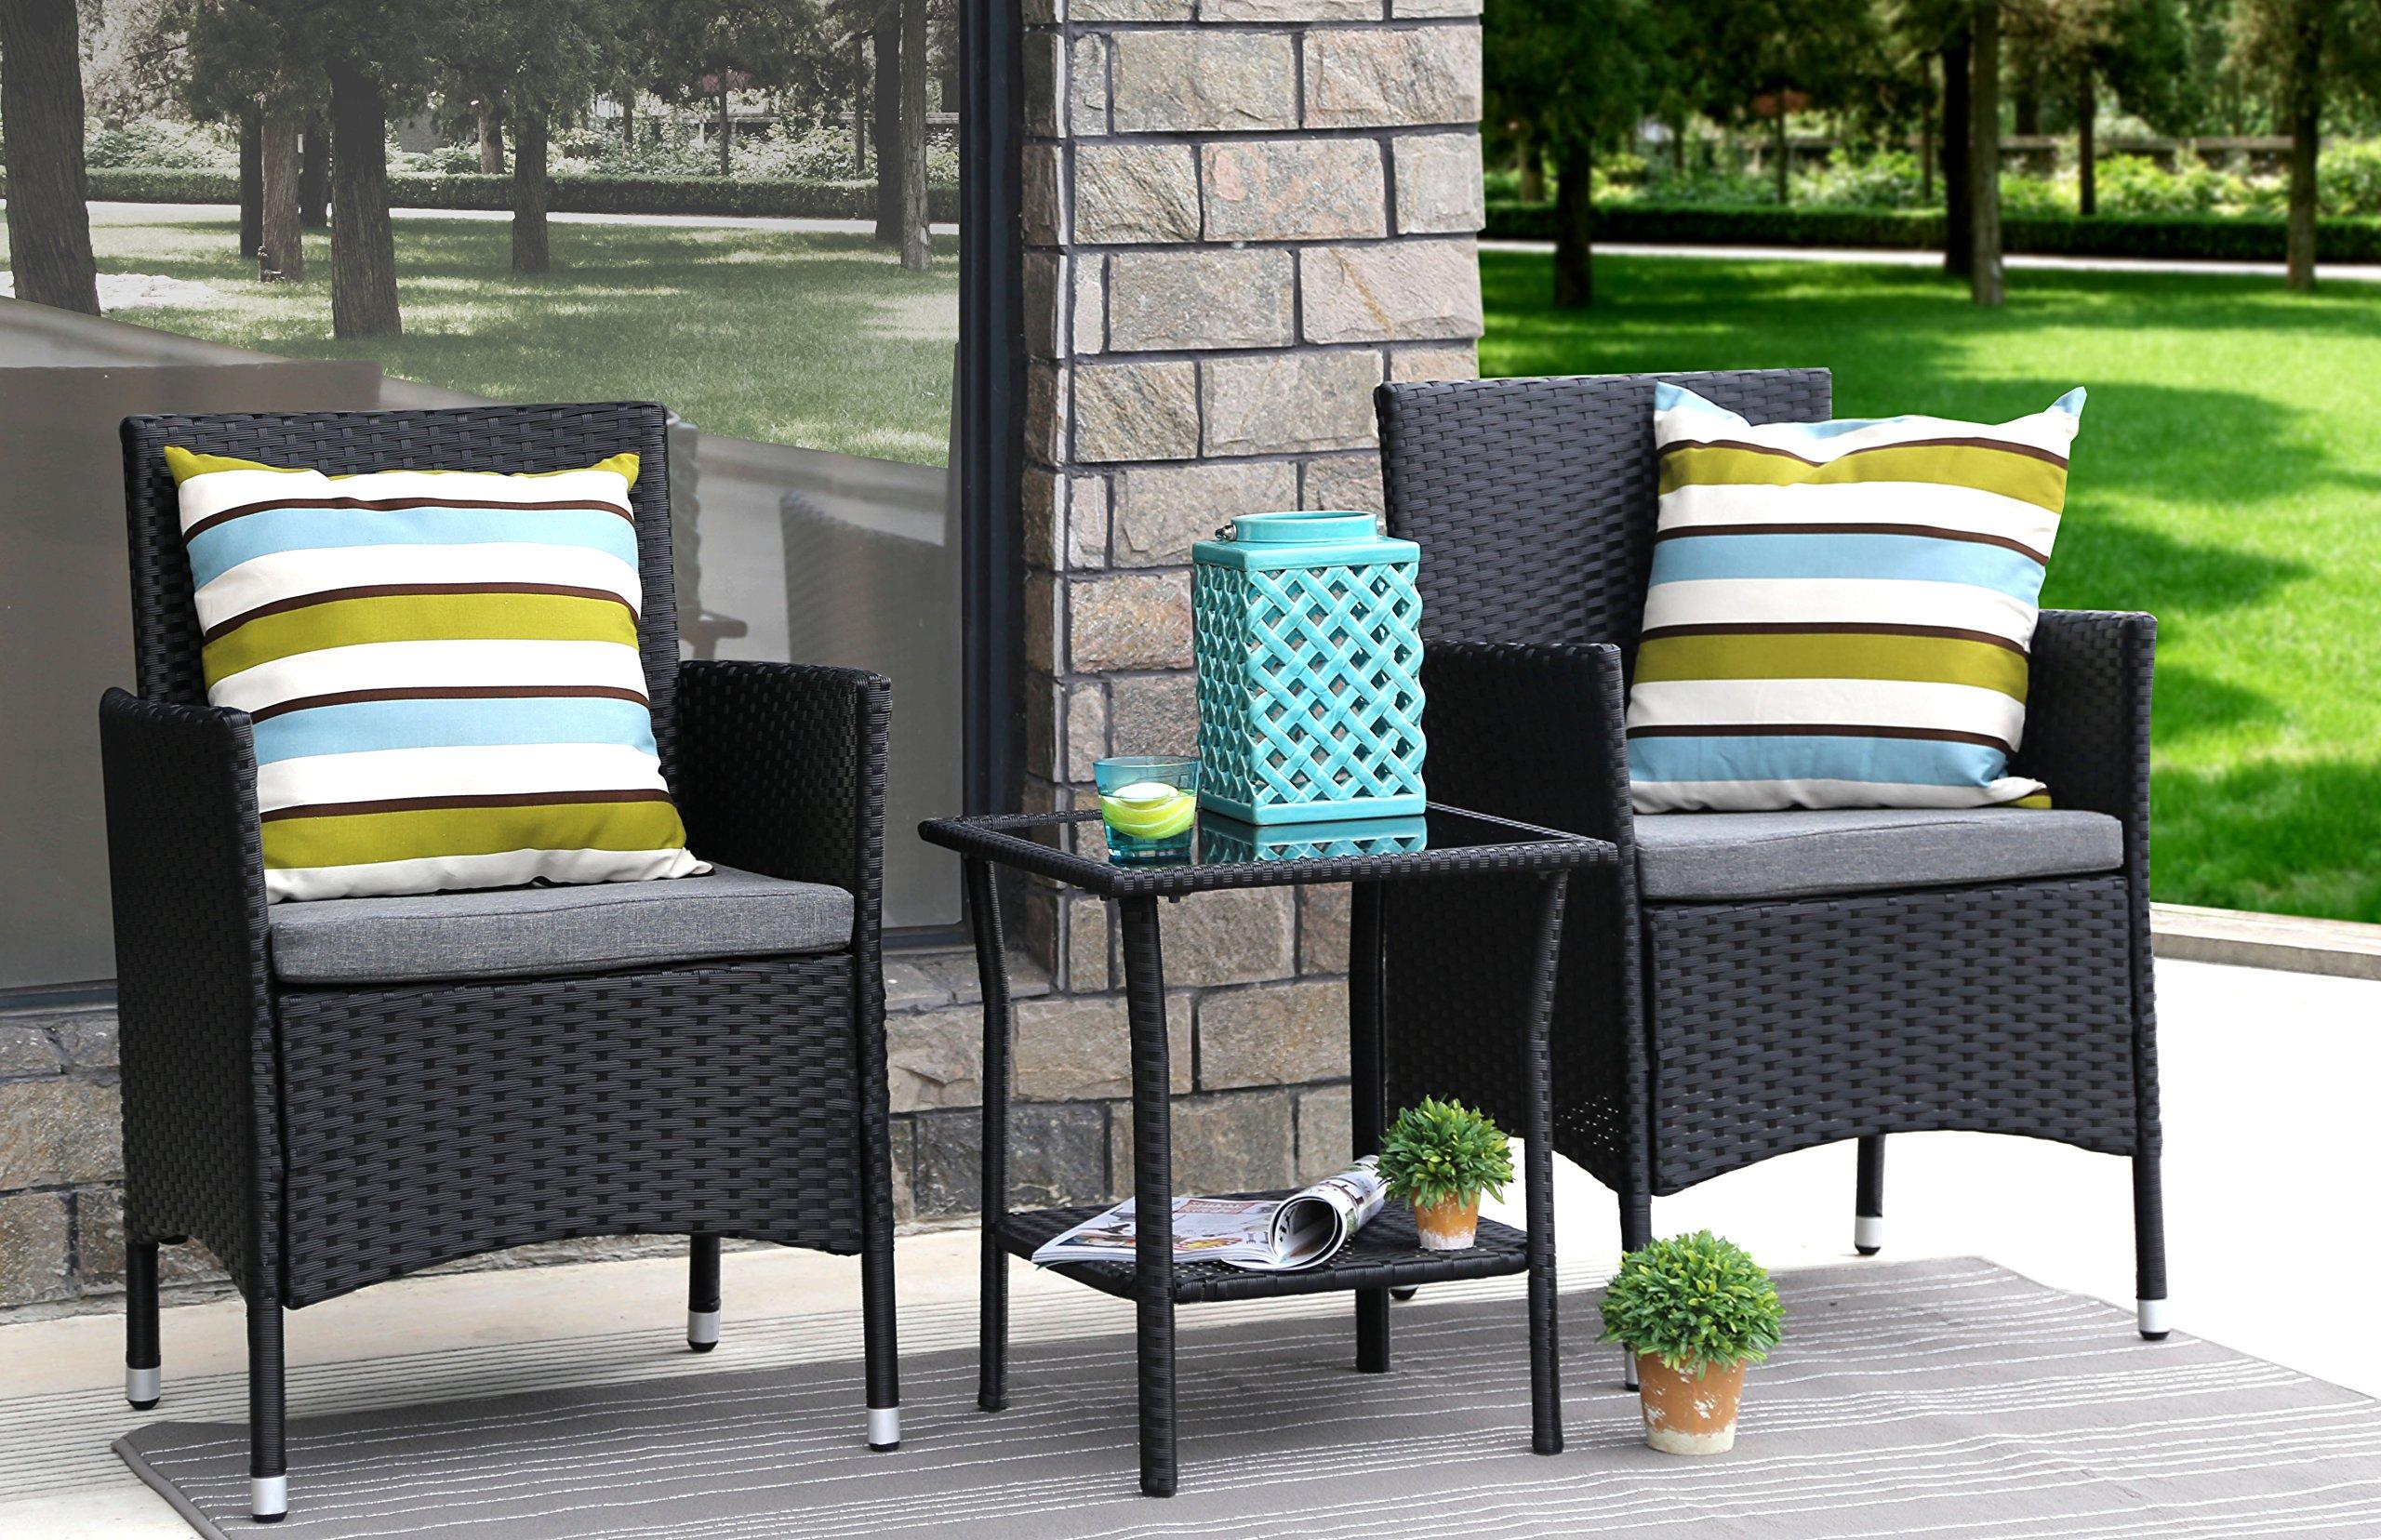 Baner Garden 3 Pieces Outdoor Furniture Complete Patio Cushion PE Wicker Rattan Garden Dining Set, Full, Black (Q16)